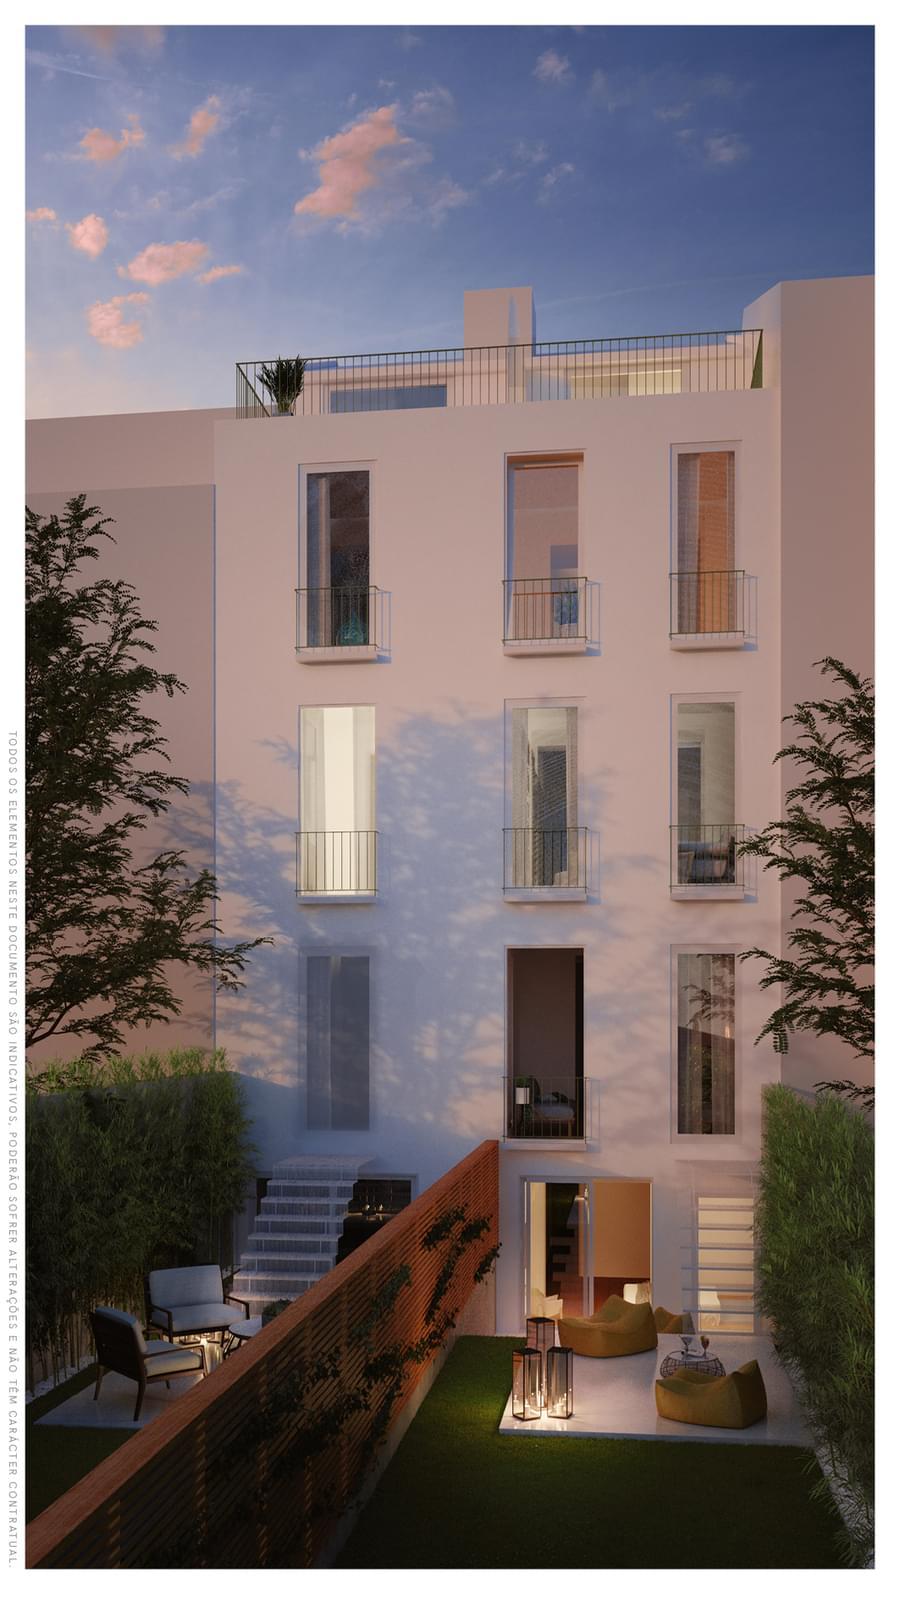 pf17325-apartamento-t3-lisboa-2fd4755f-fc8e-4033-a911-7b8086f76163